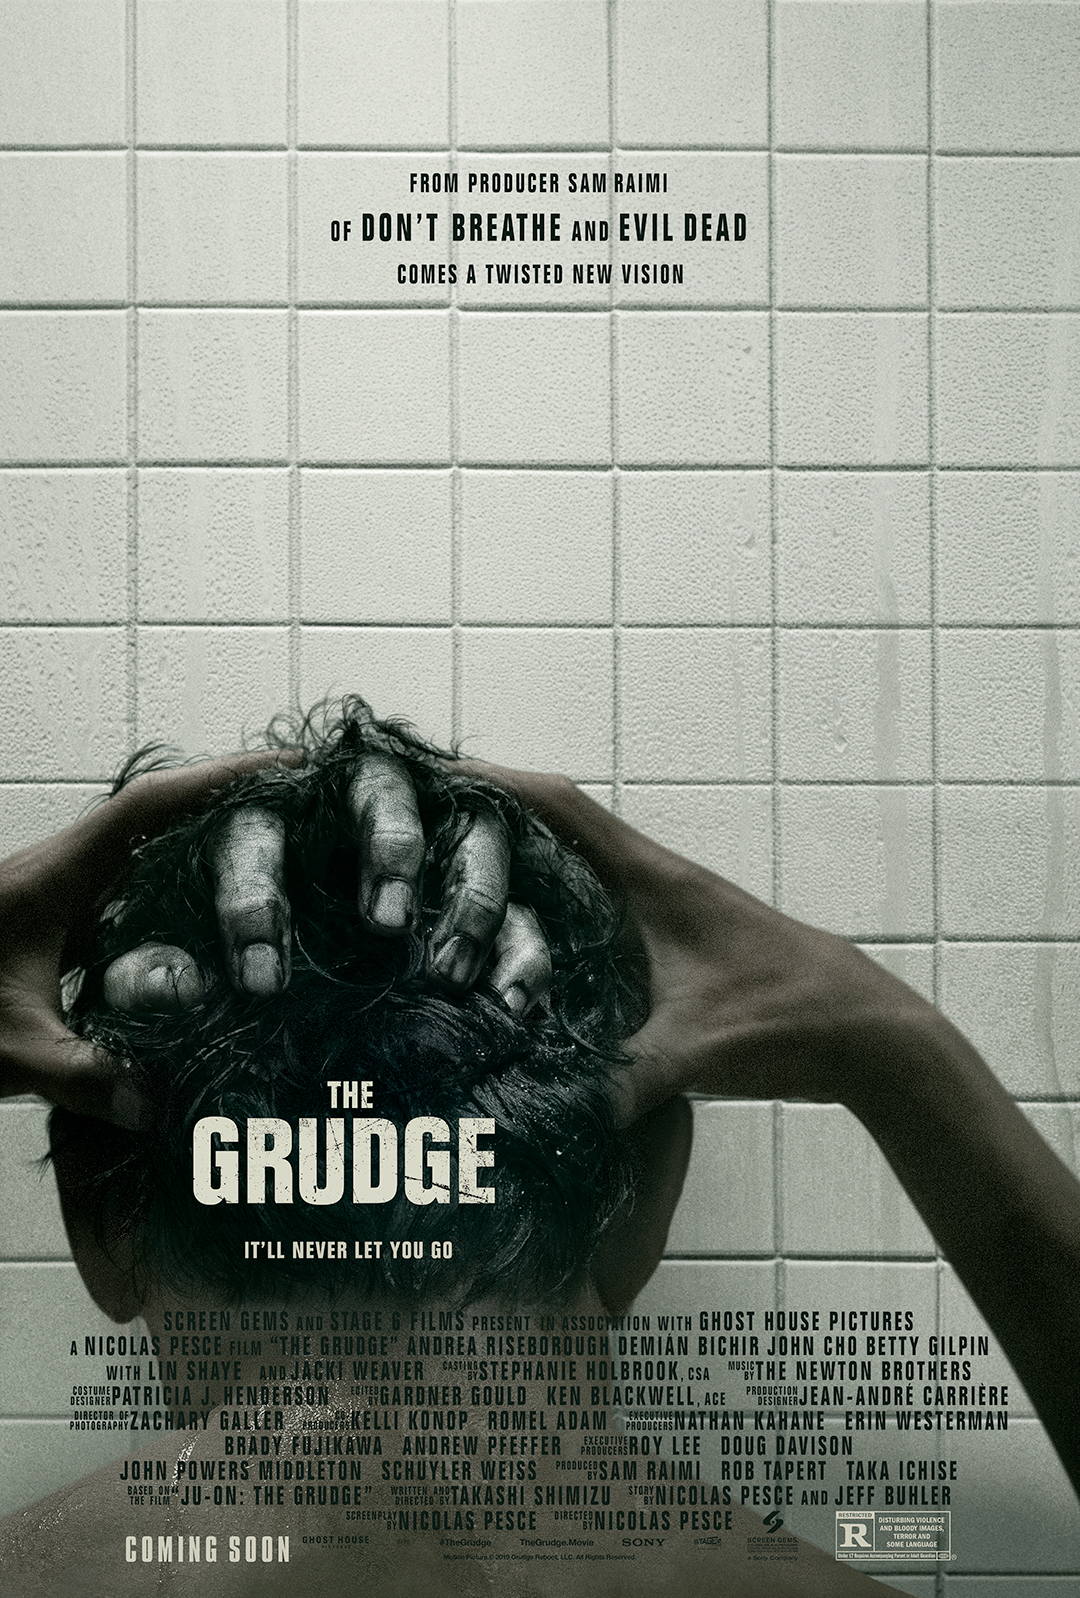 BluRay 1080p | The.Grudge.2020 فيلم الرعب الضغينة مُترجم -- Seeders: 2 -- Leechers: 2